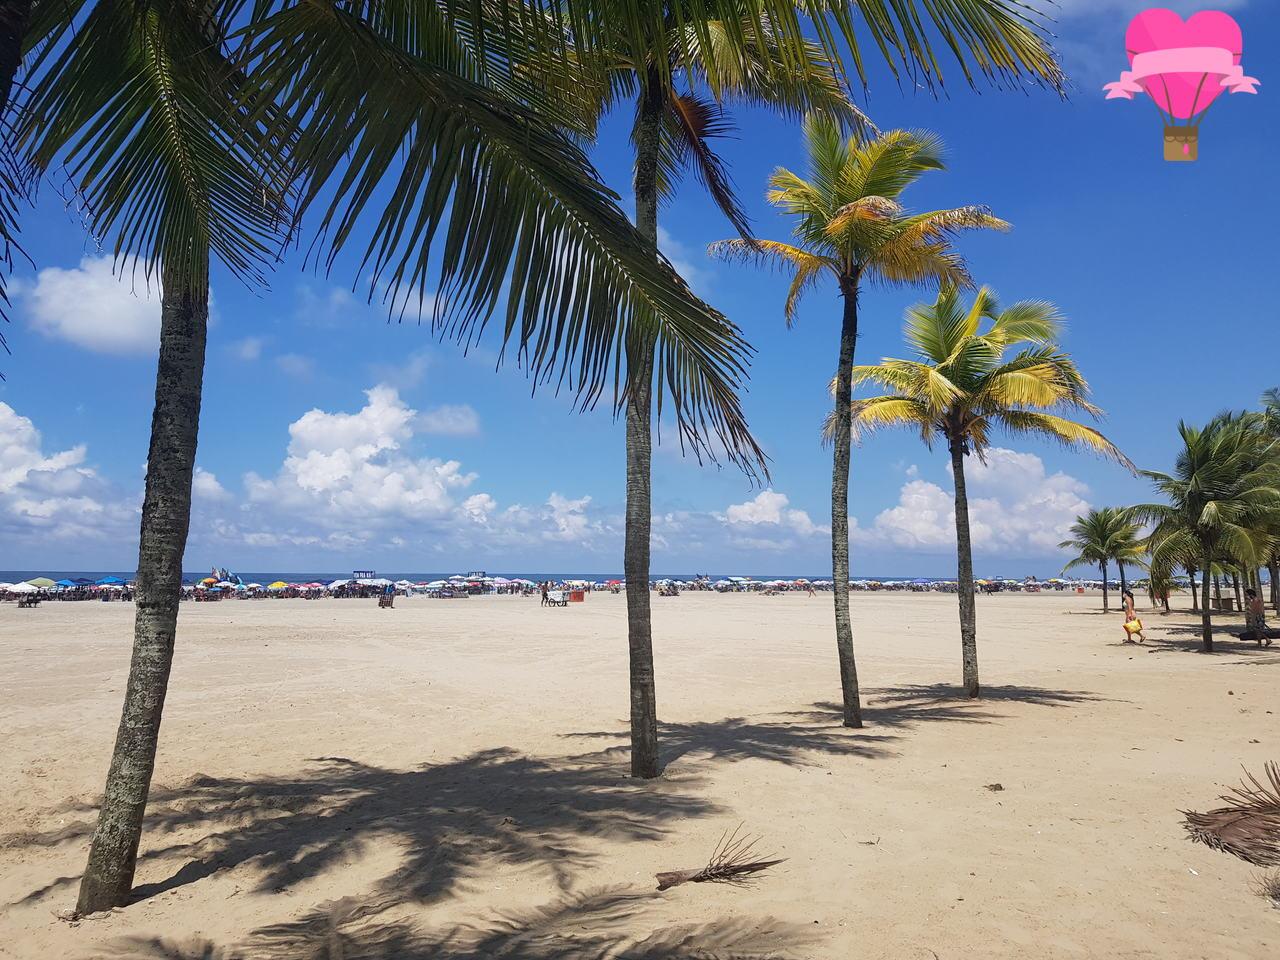 praia-guilhermina-praia-grande-sp